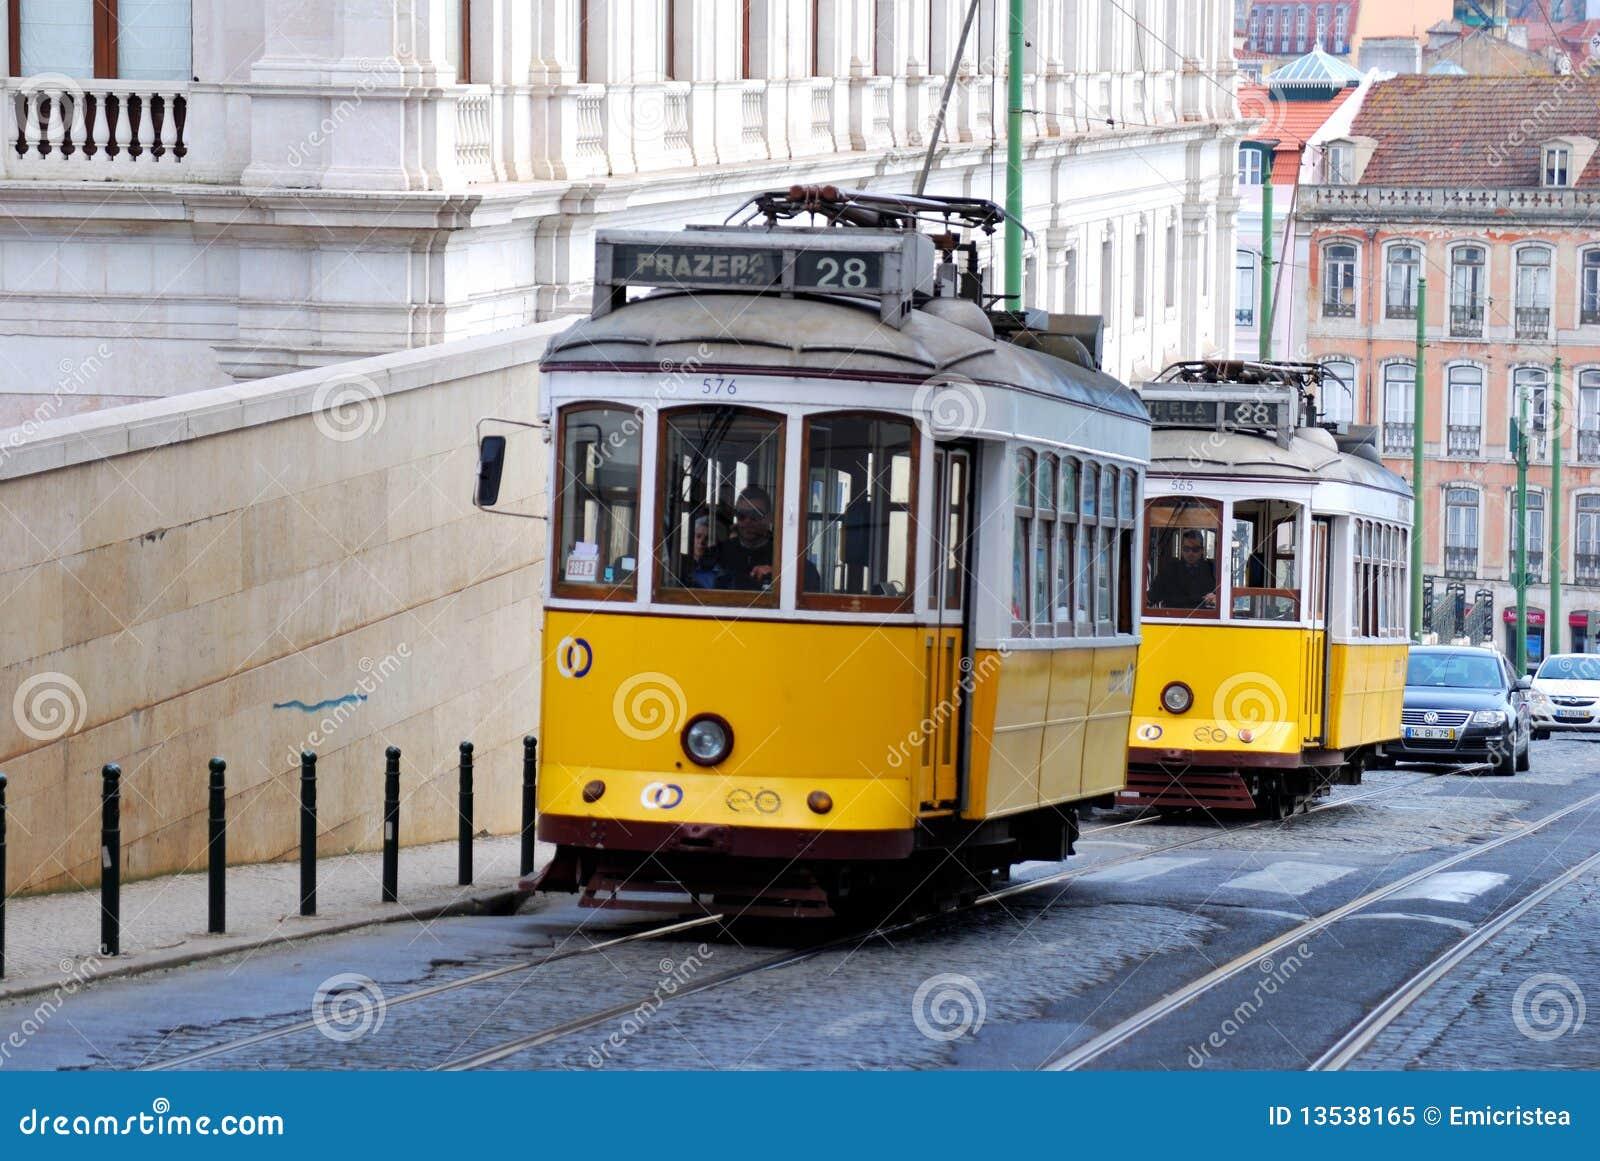 tramway jaune de lisbonne borne limite du portugal image ditorial image du portugal public. Black Bedroom Furniture Sets. Home Design Ideas